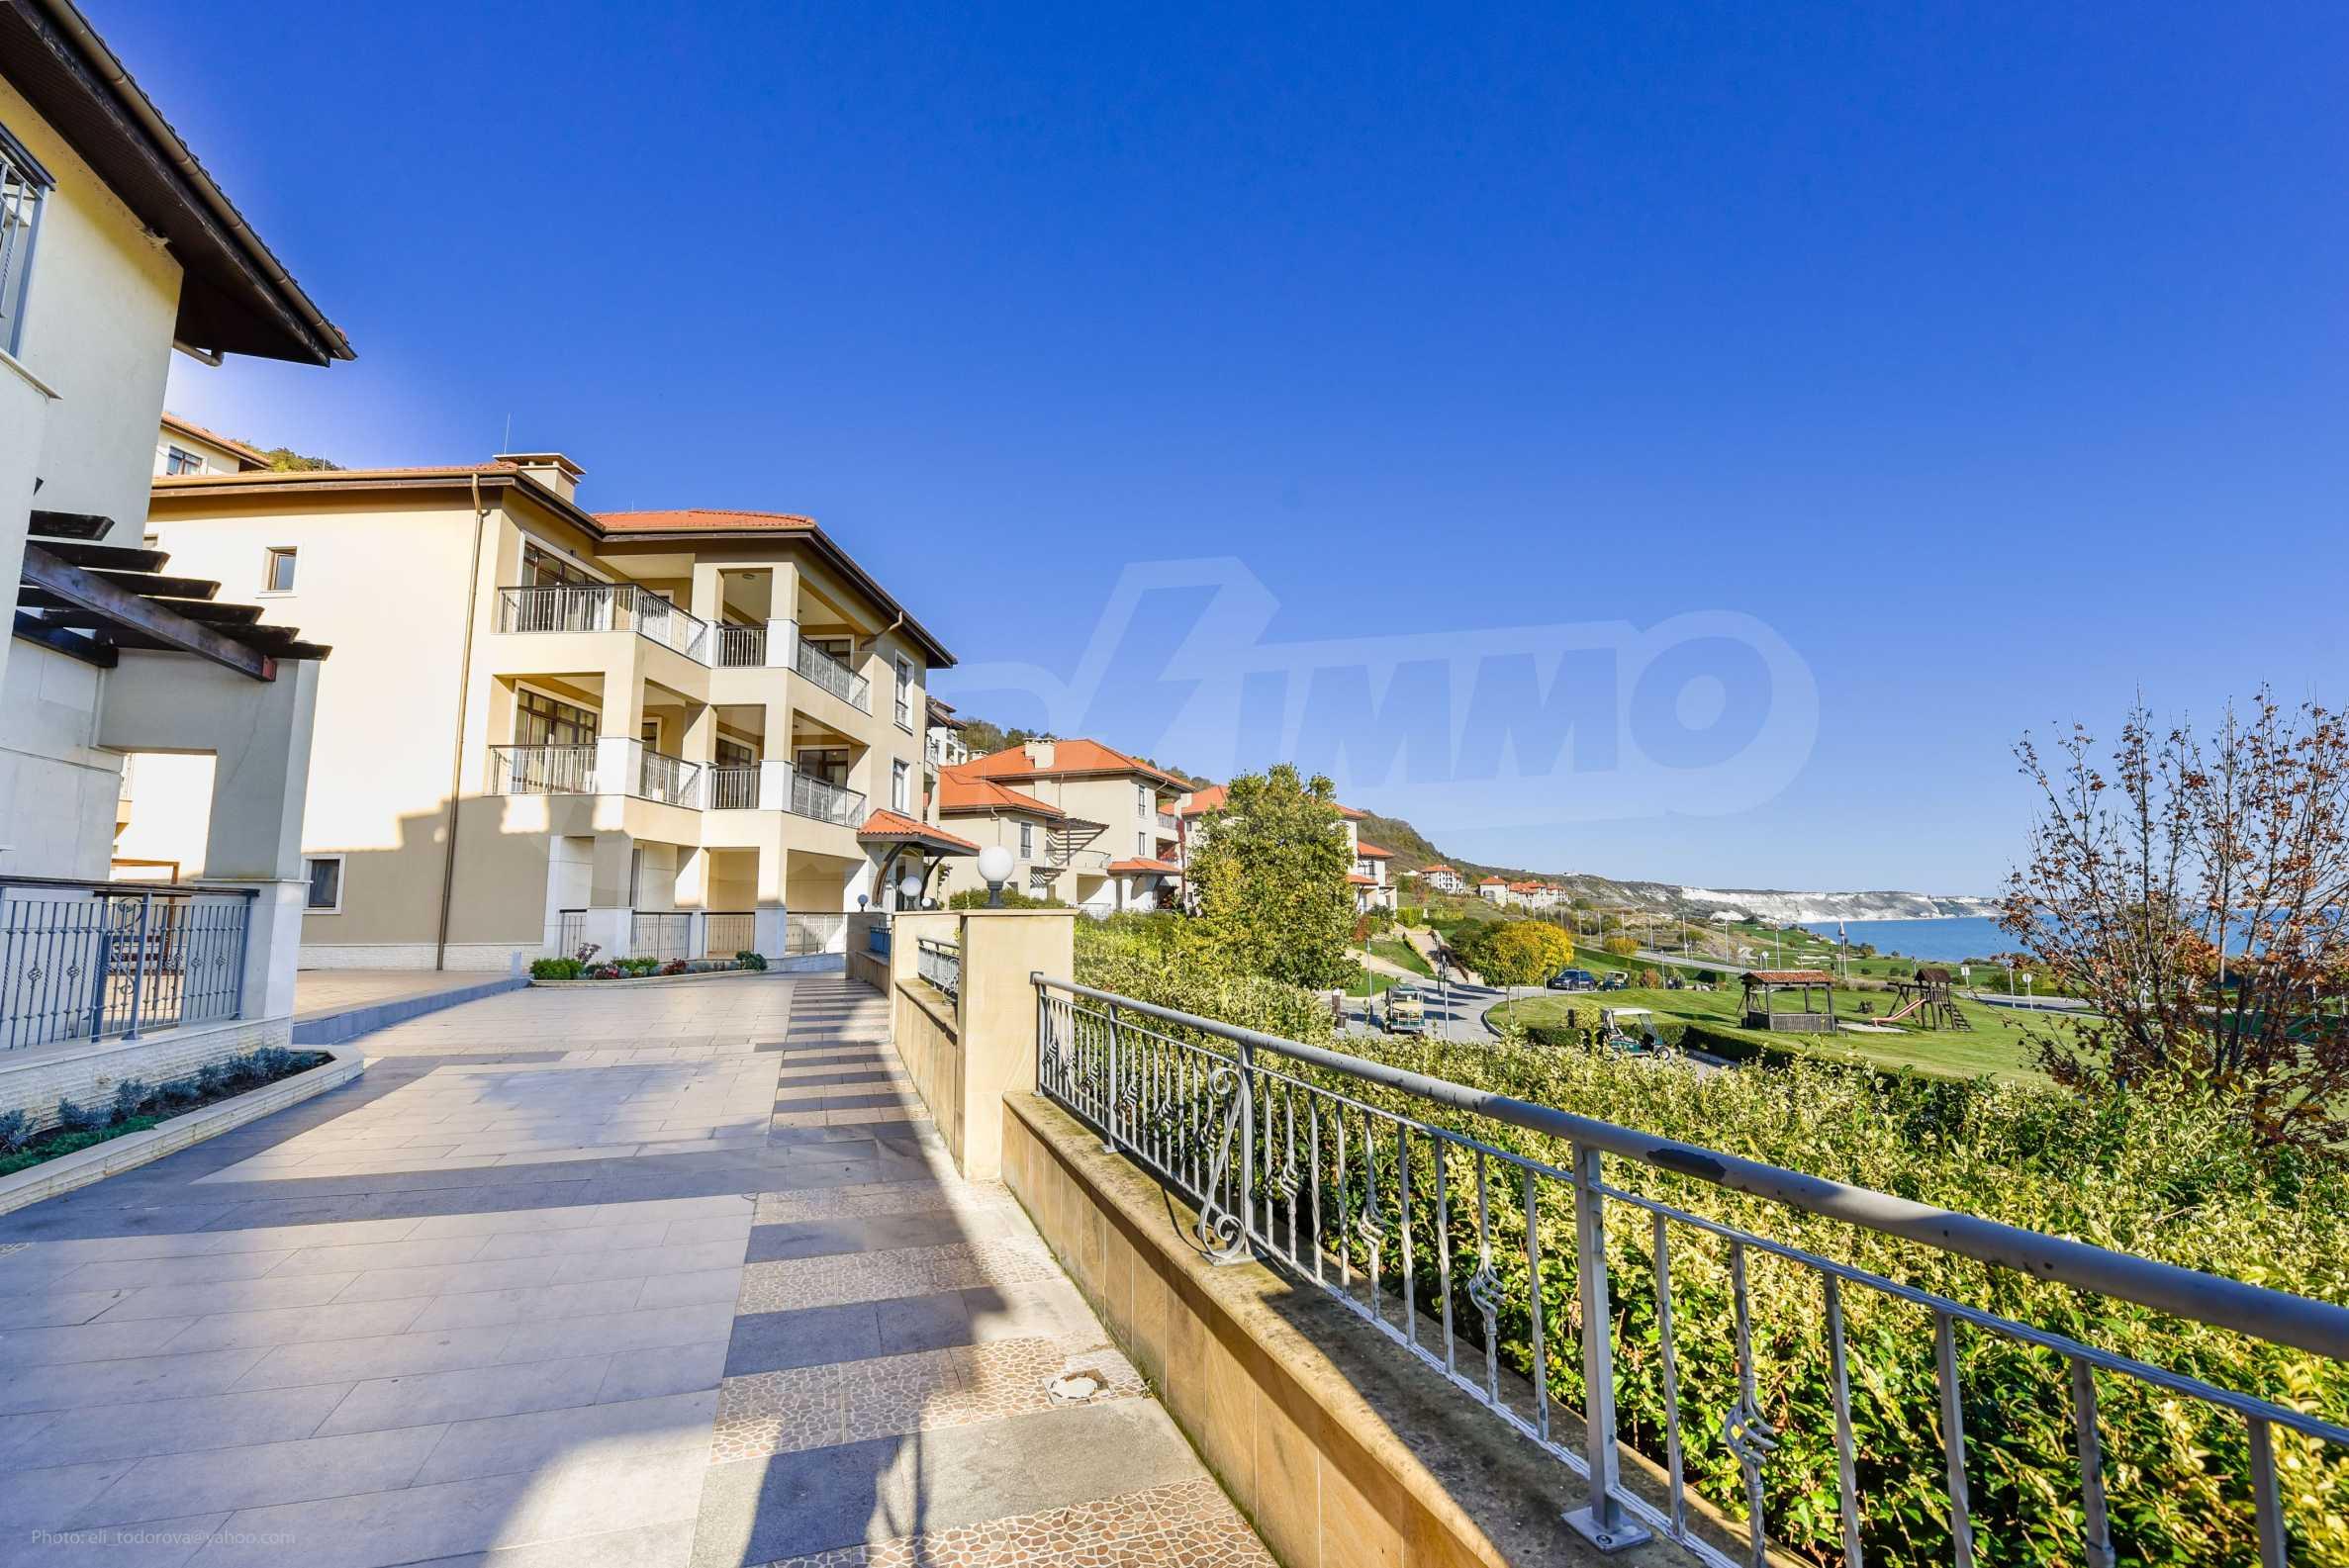 Thracian Cliffs Golf & Beach Resort - голф курорт от световна класа 8